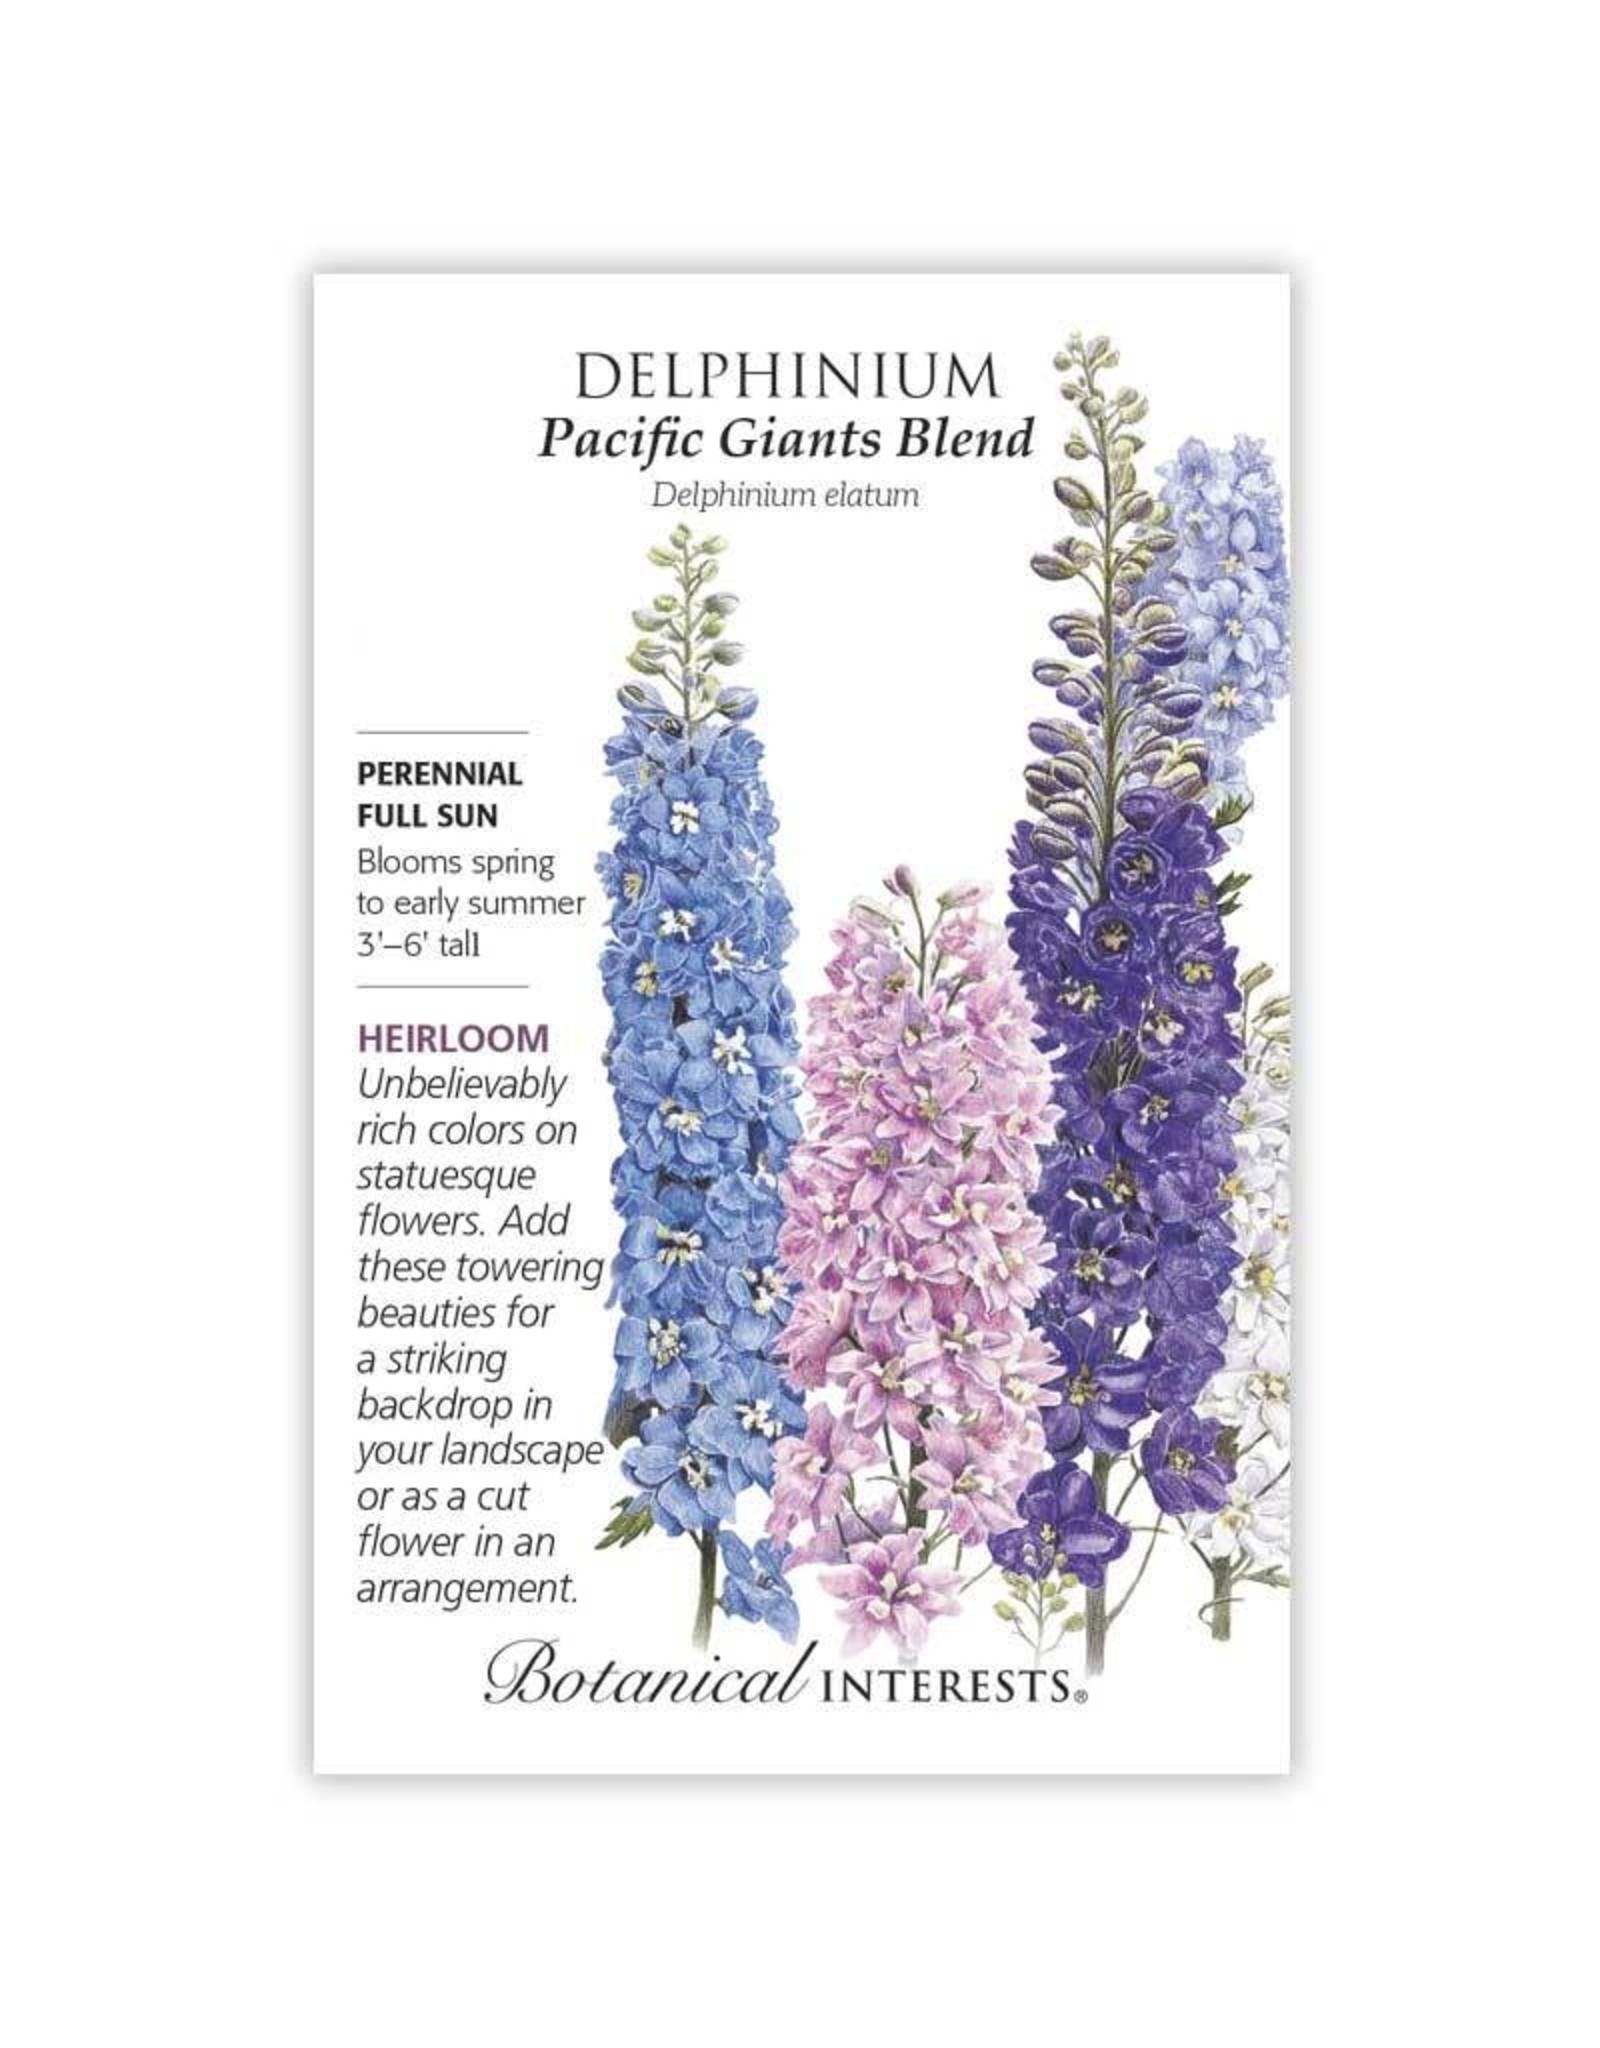 Seeds - Delphinium Pacific Giant Blend